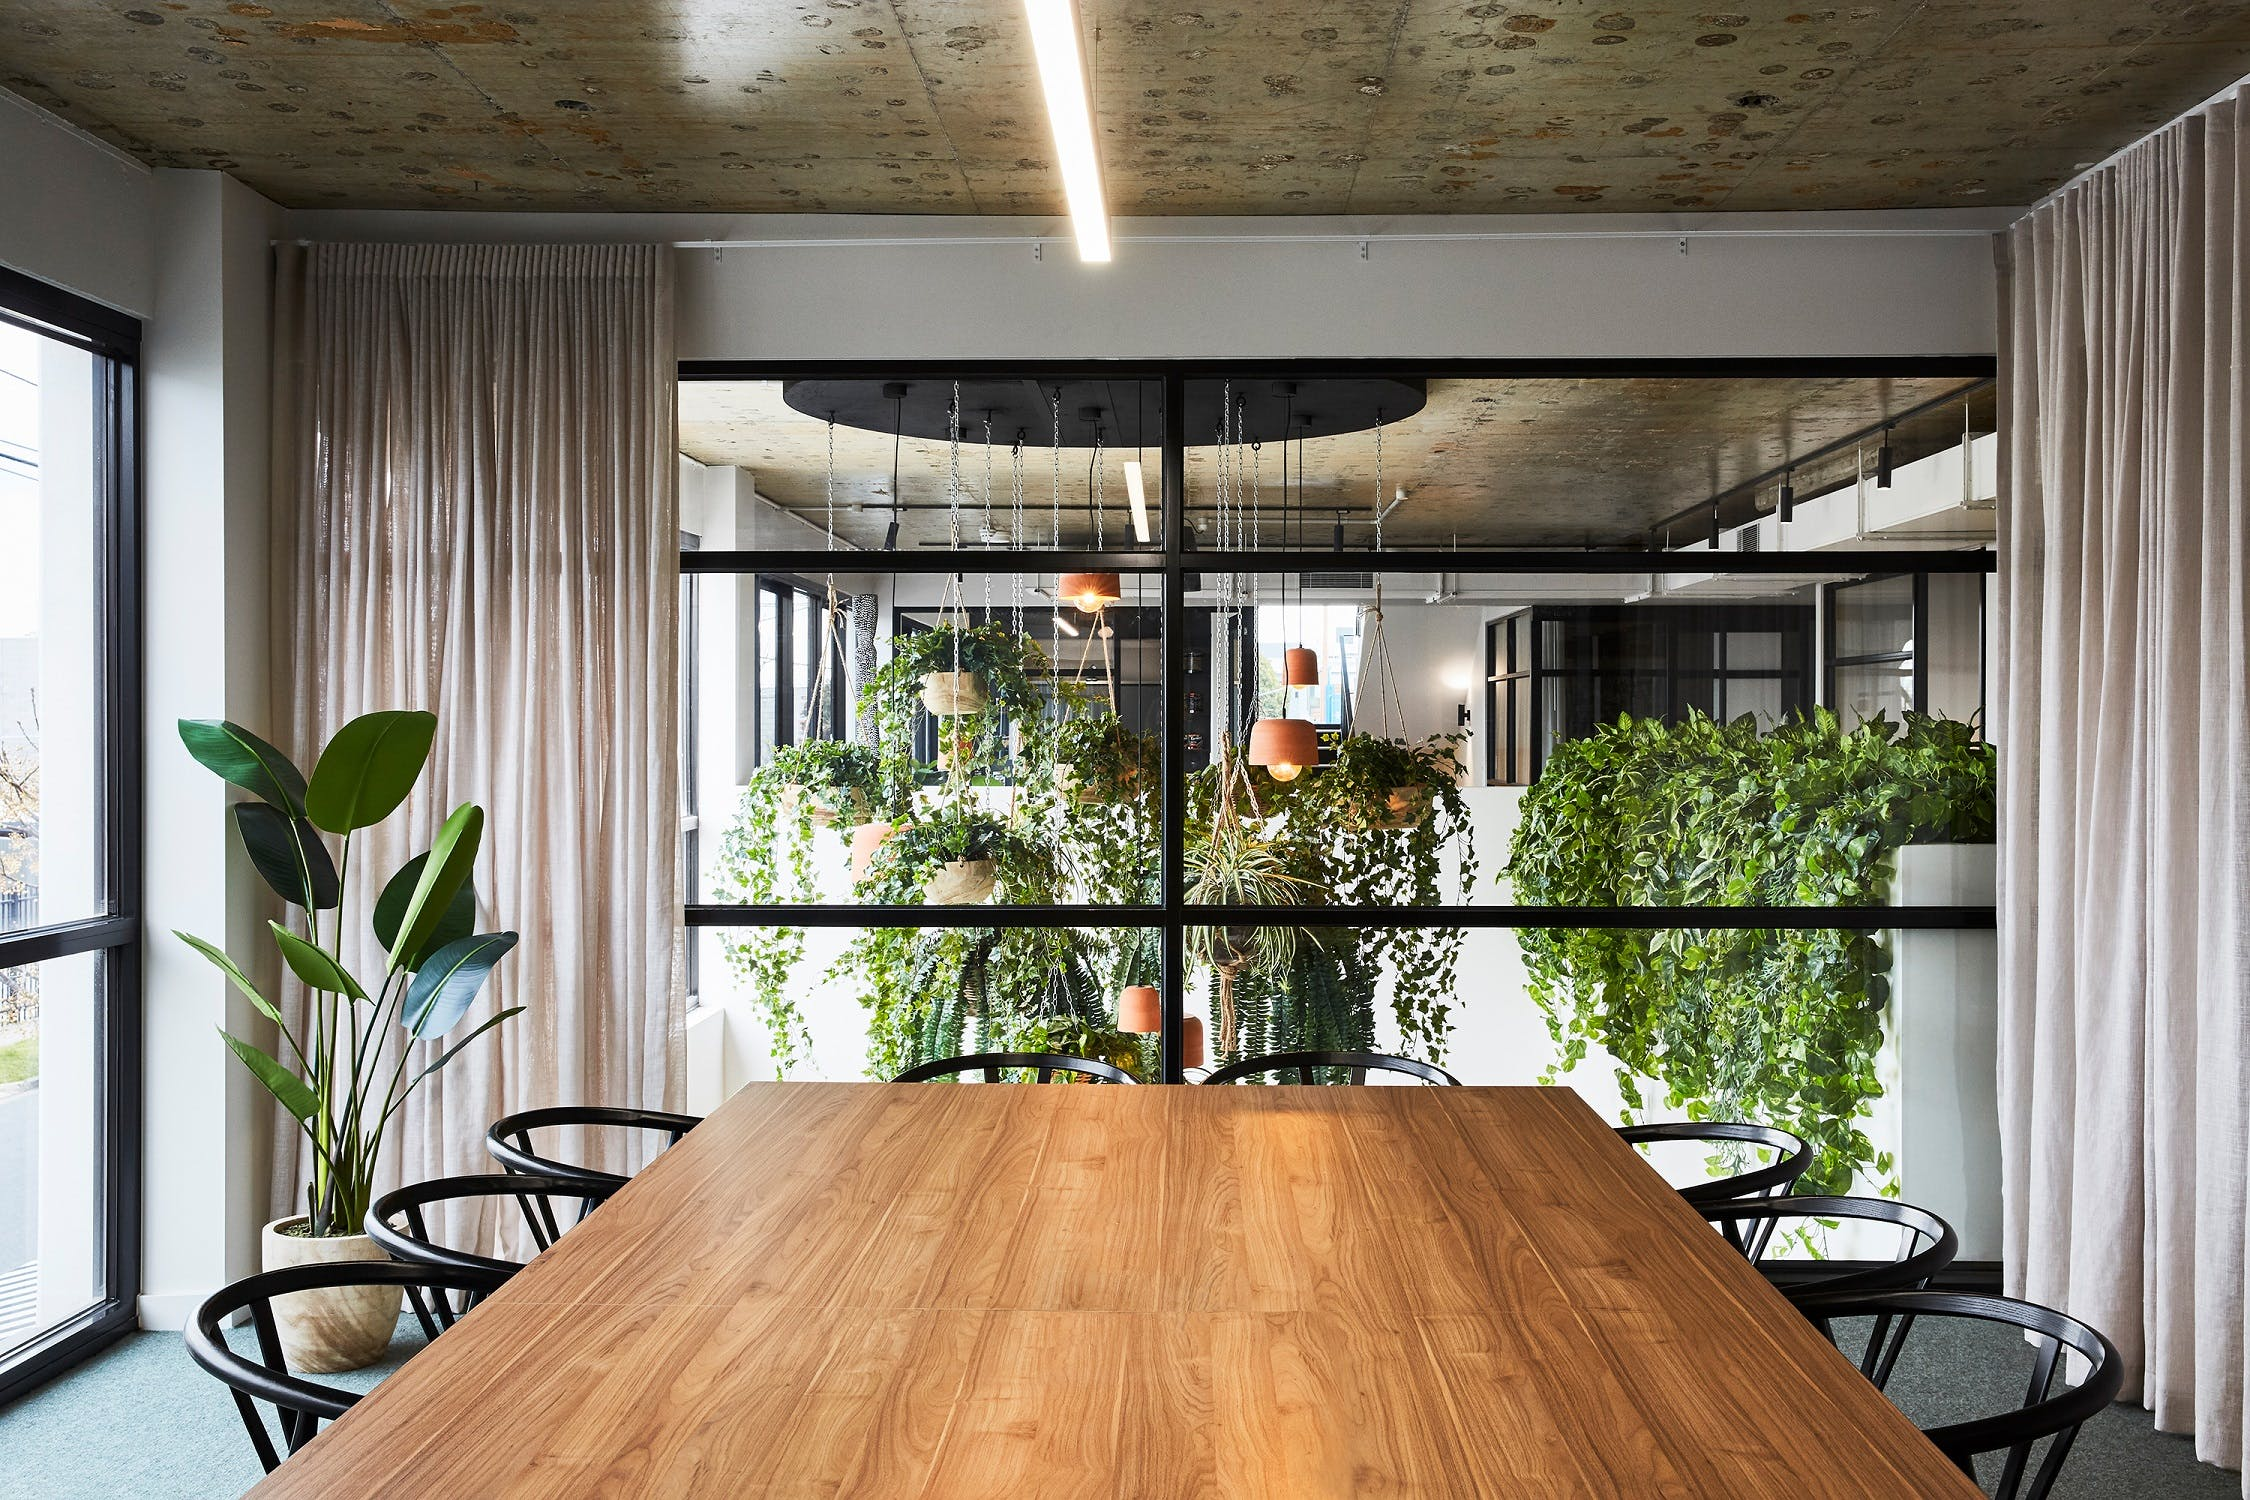 Shanghai Executive Boardroom, meeting room at Carman's Space, image 1